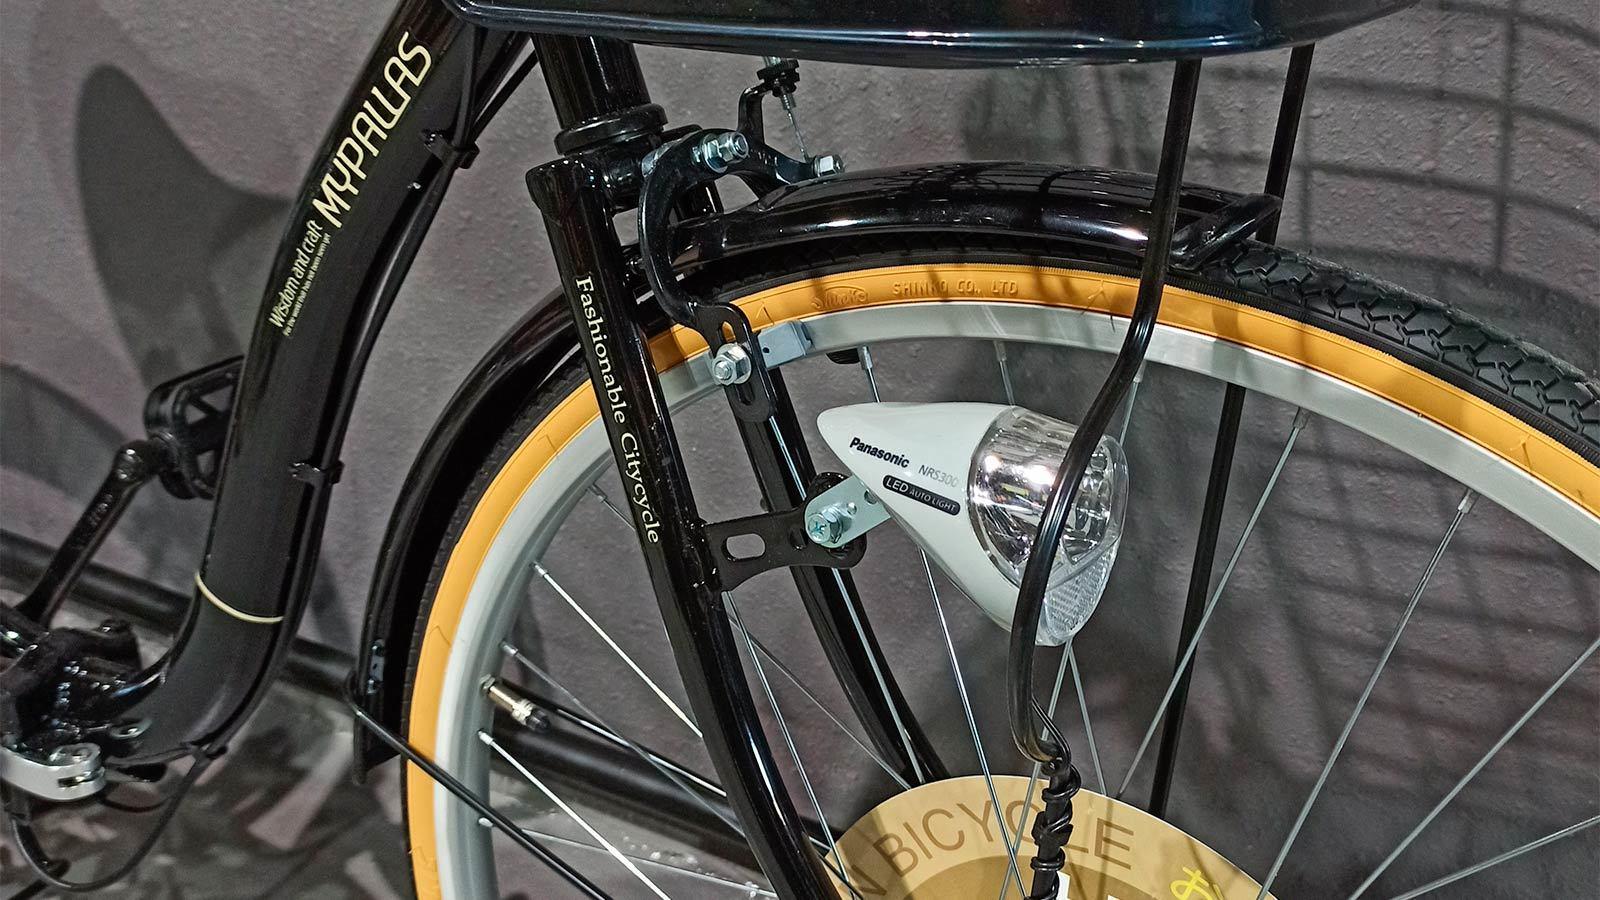 вилка переднего колеса складного велосипеда MyPallas M509